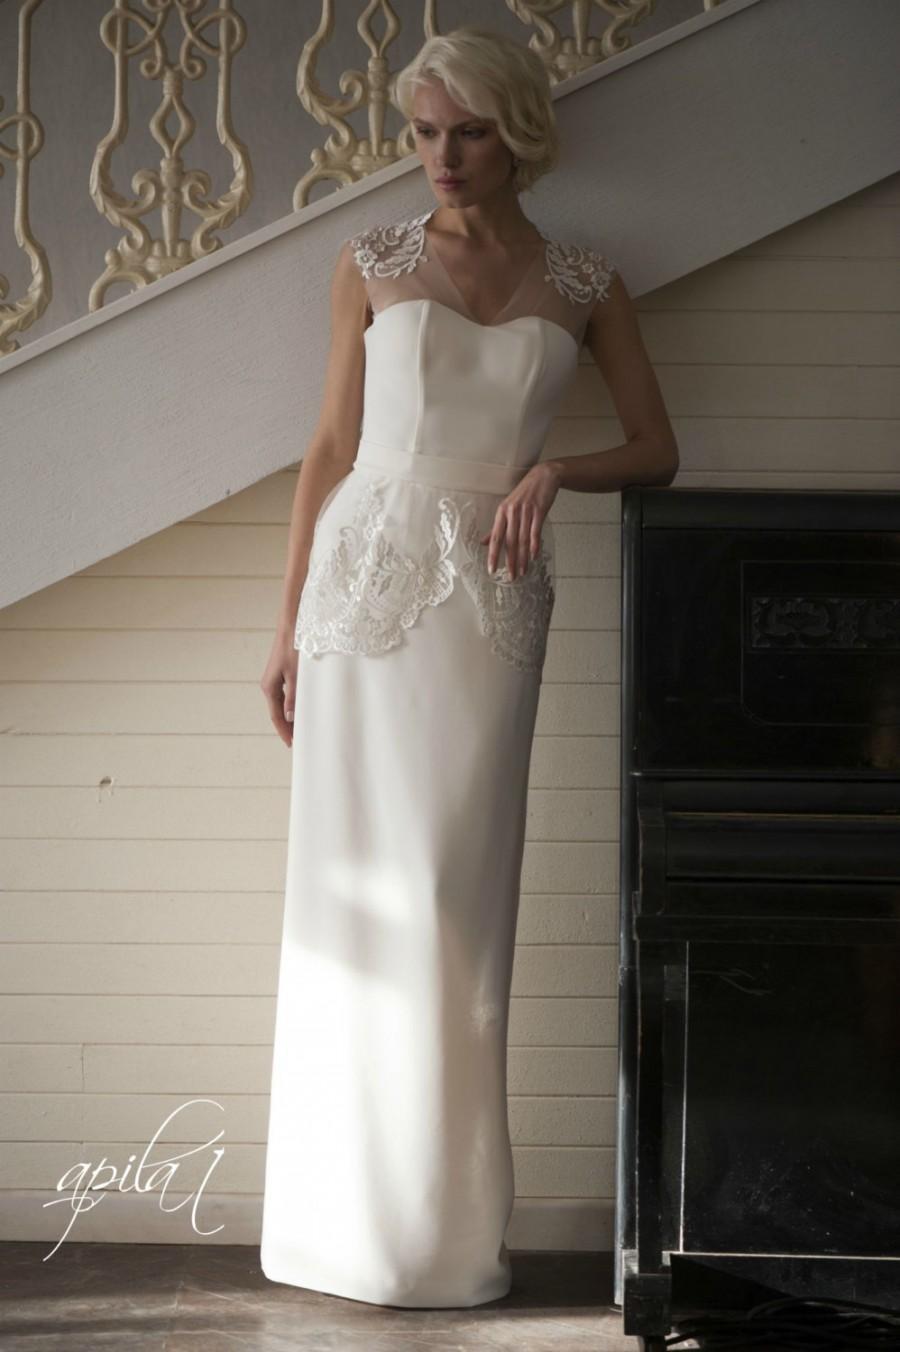 زفاف - Ivory Long Wedding Dress, Crepe and Lace Dress L3(with long and short skirts), Romantic wedding gown, Classic bridal dress, Custom dress